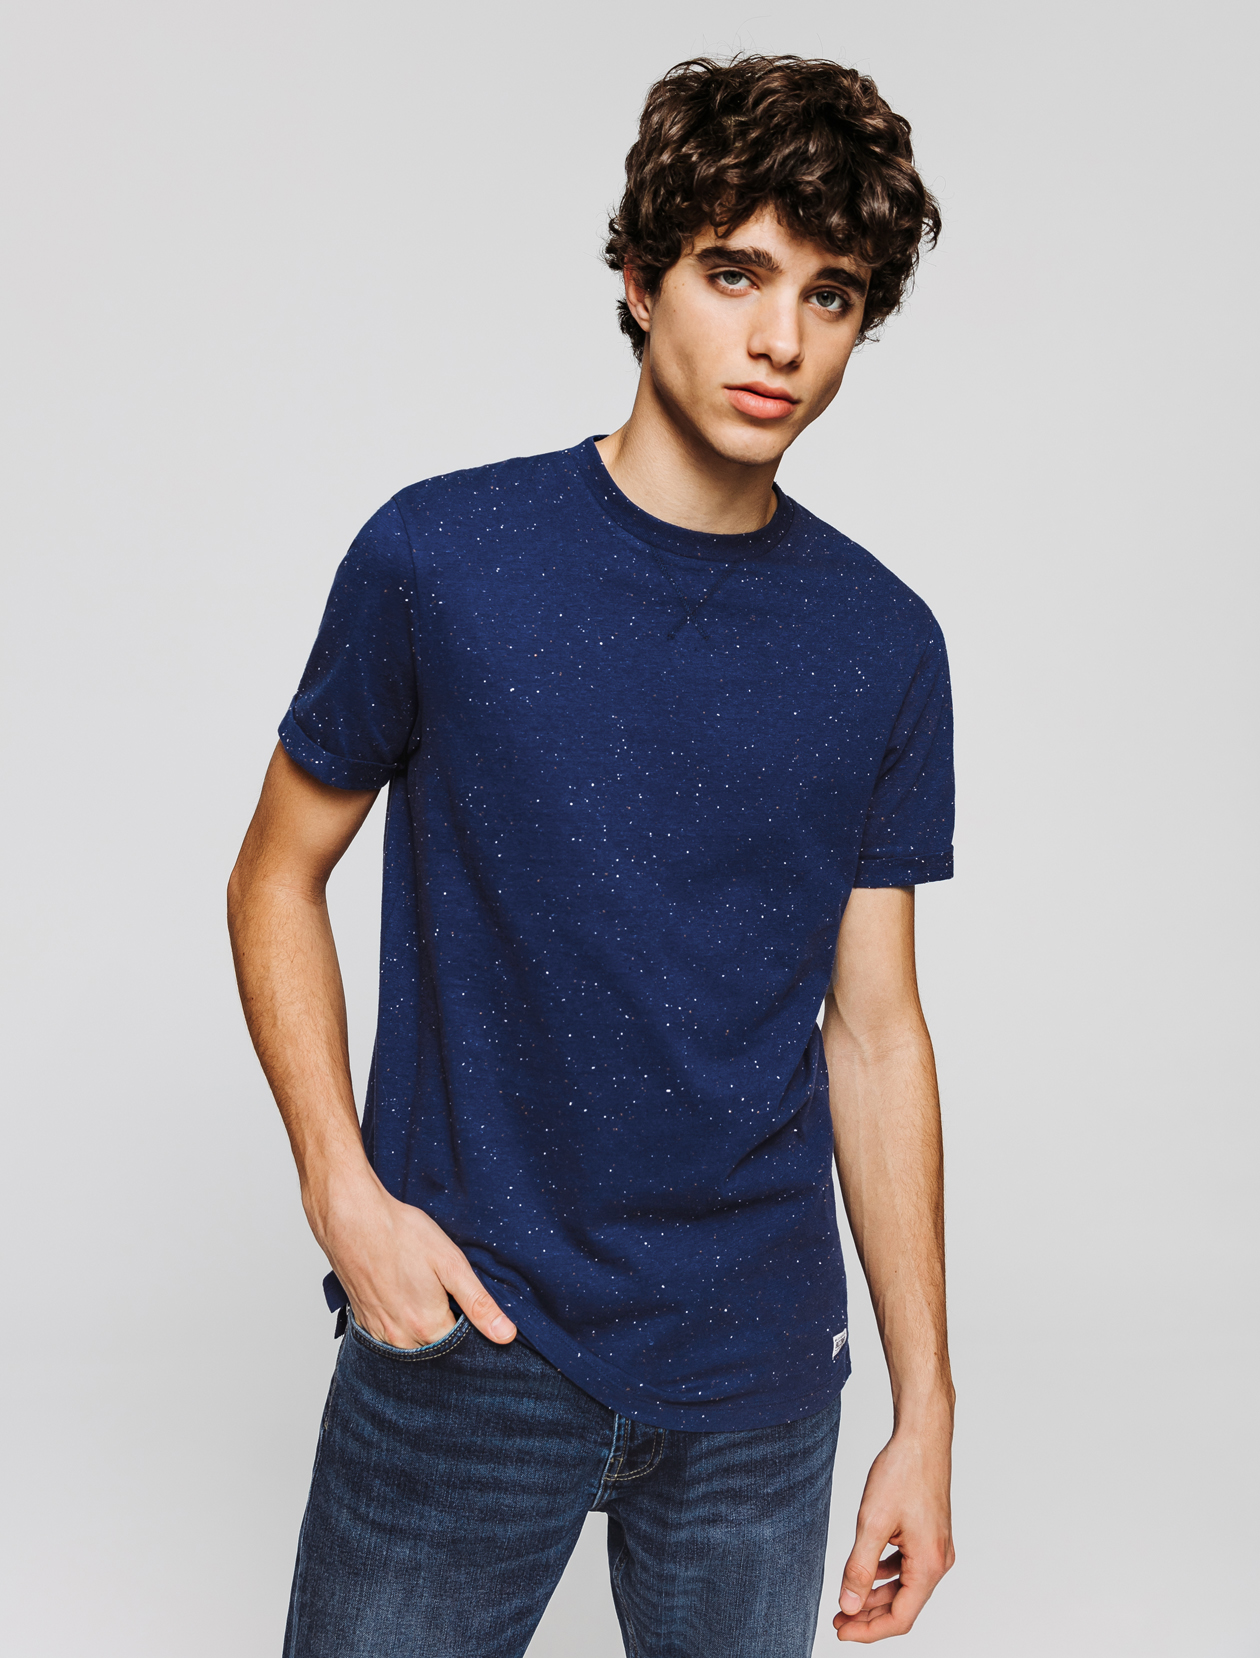 T-shirt coton nep's manches courtes  homme